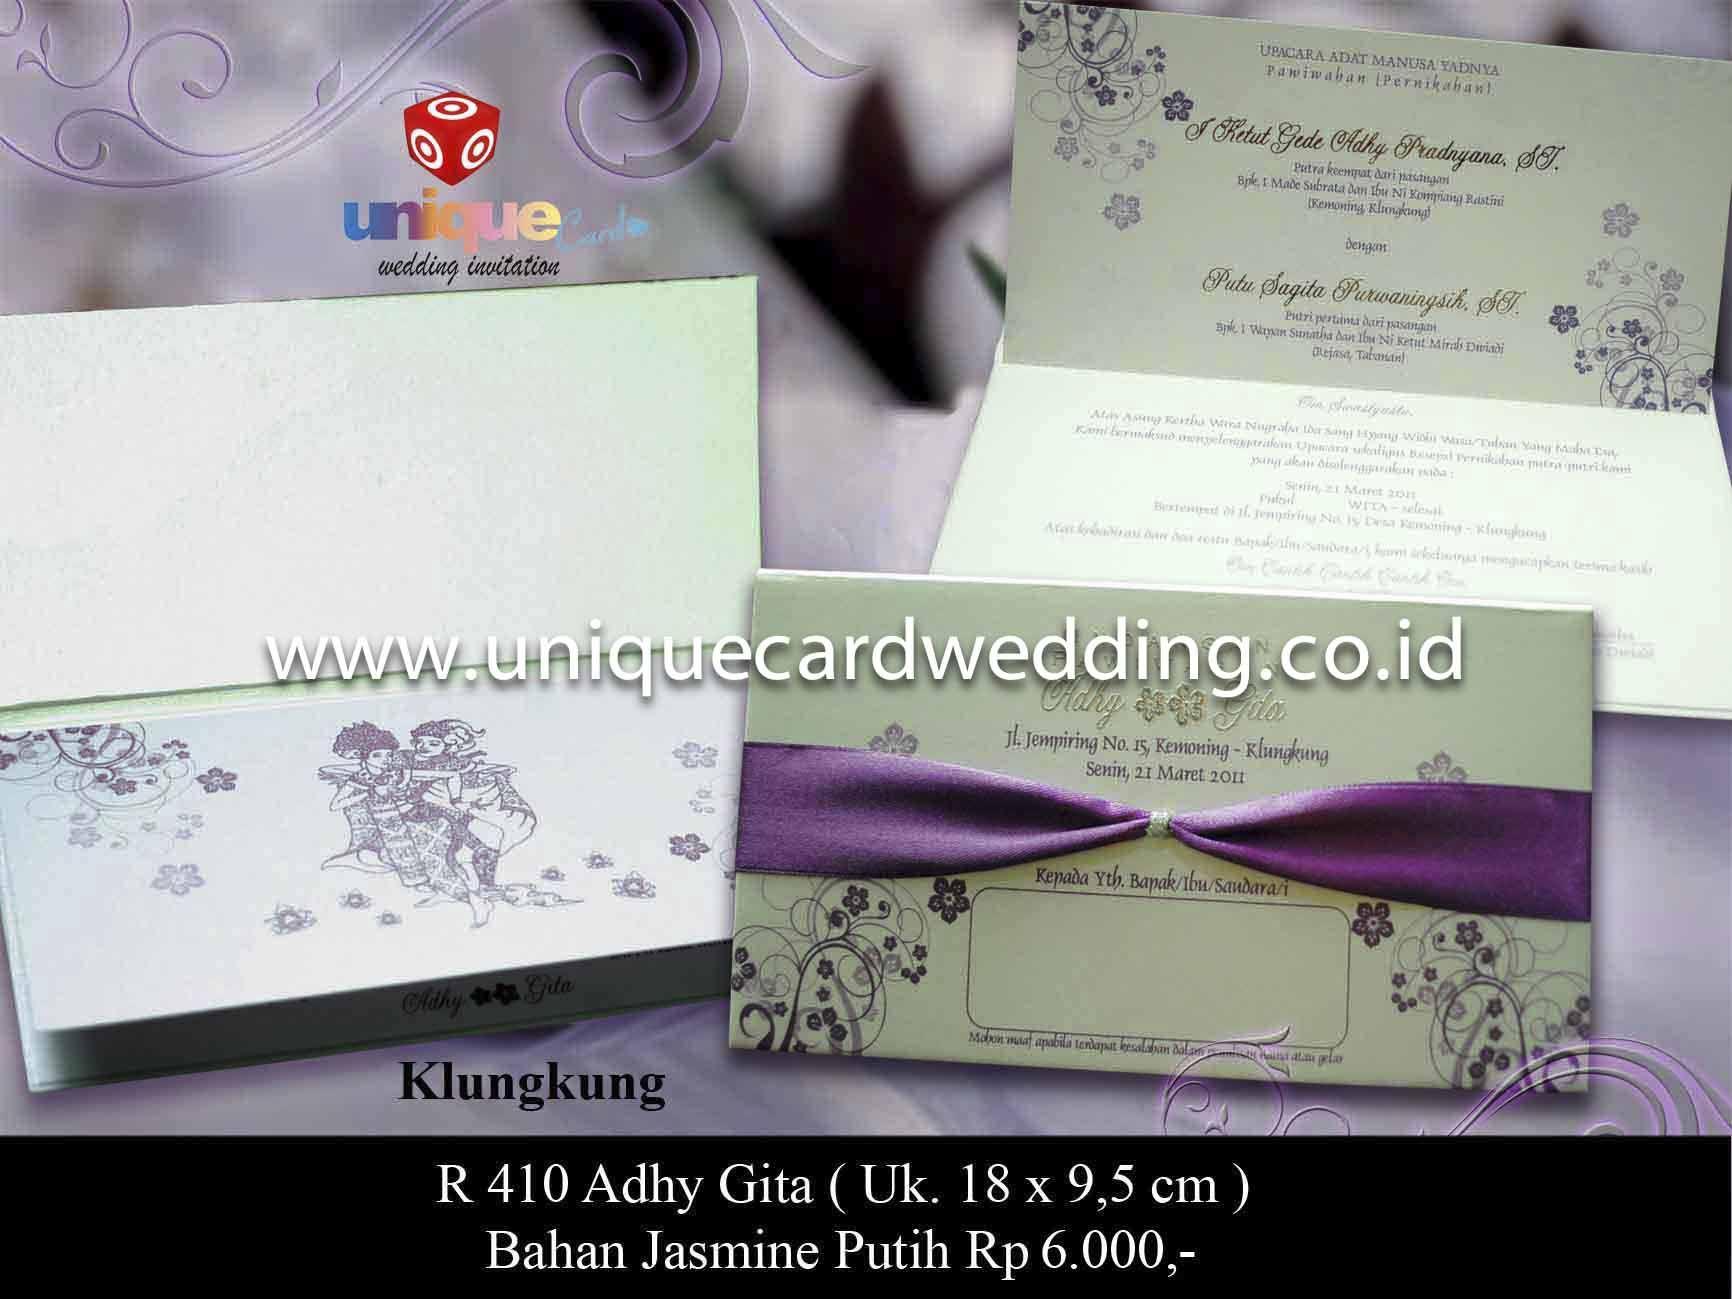 Wedding invitation card bandung invitations party invitations wedding invitation card bandung invitations party invitations junglespirit Gallery